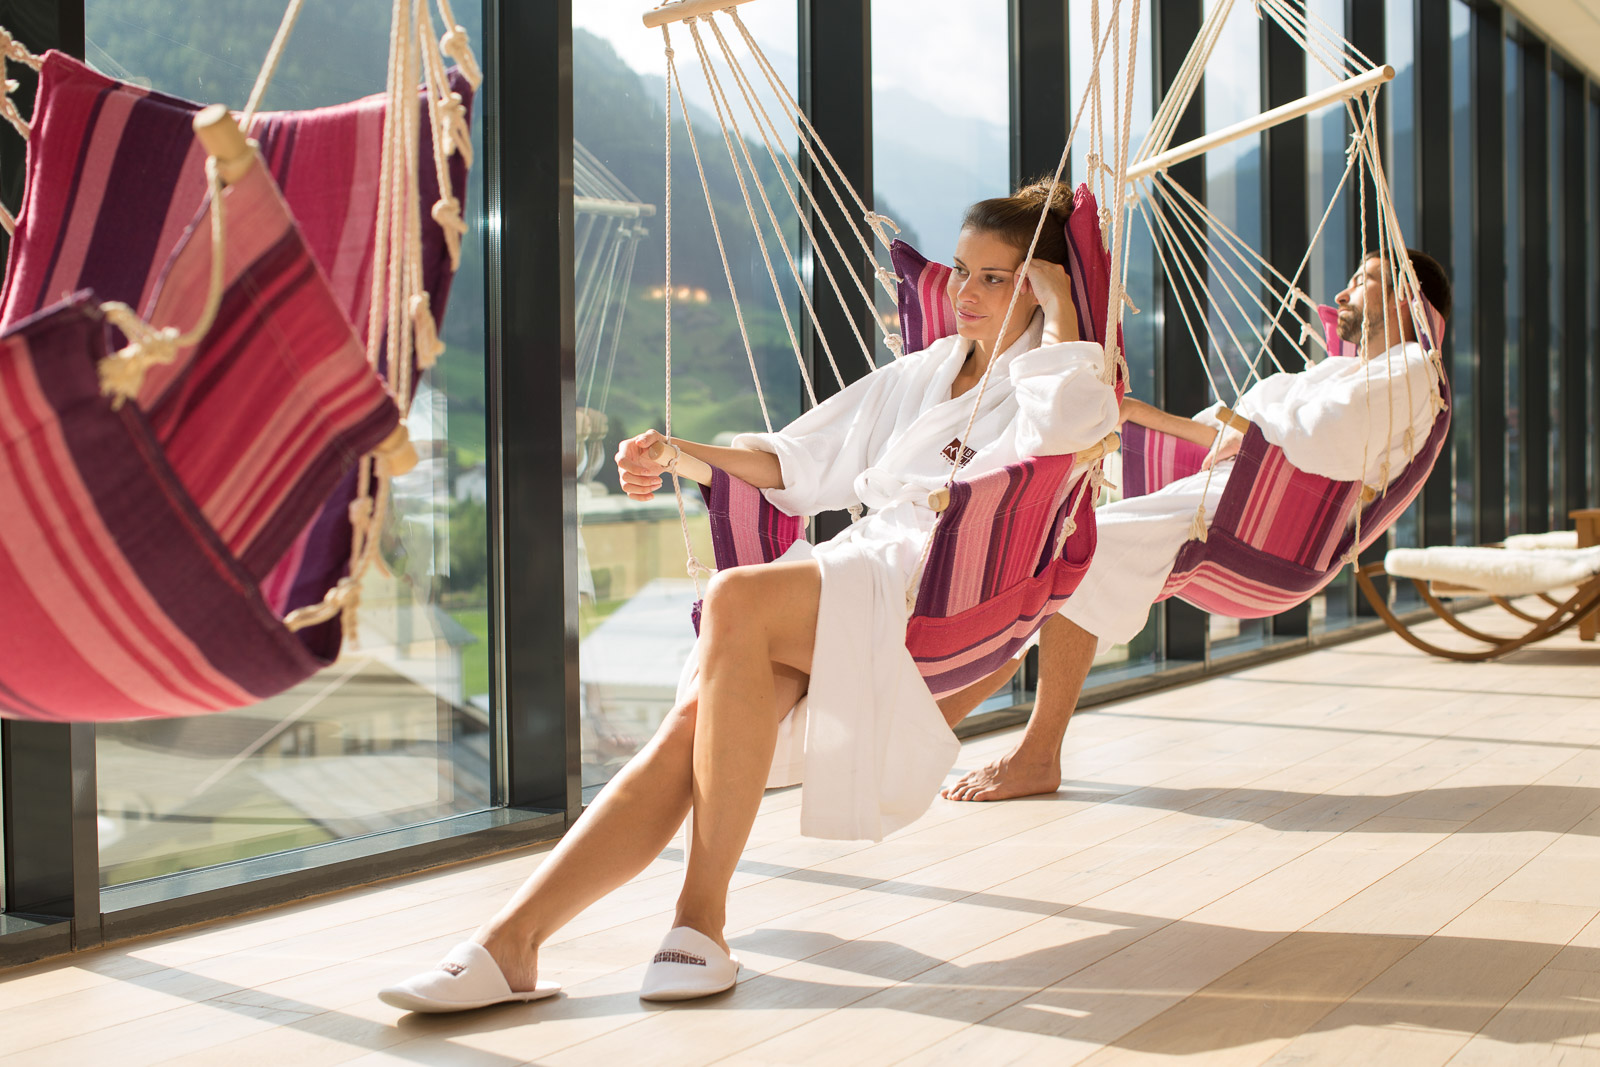 Hydrojet: Foto vom Wellnesshotel Bergland Hotel Sölden   Wellness Tirol